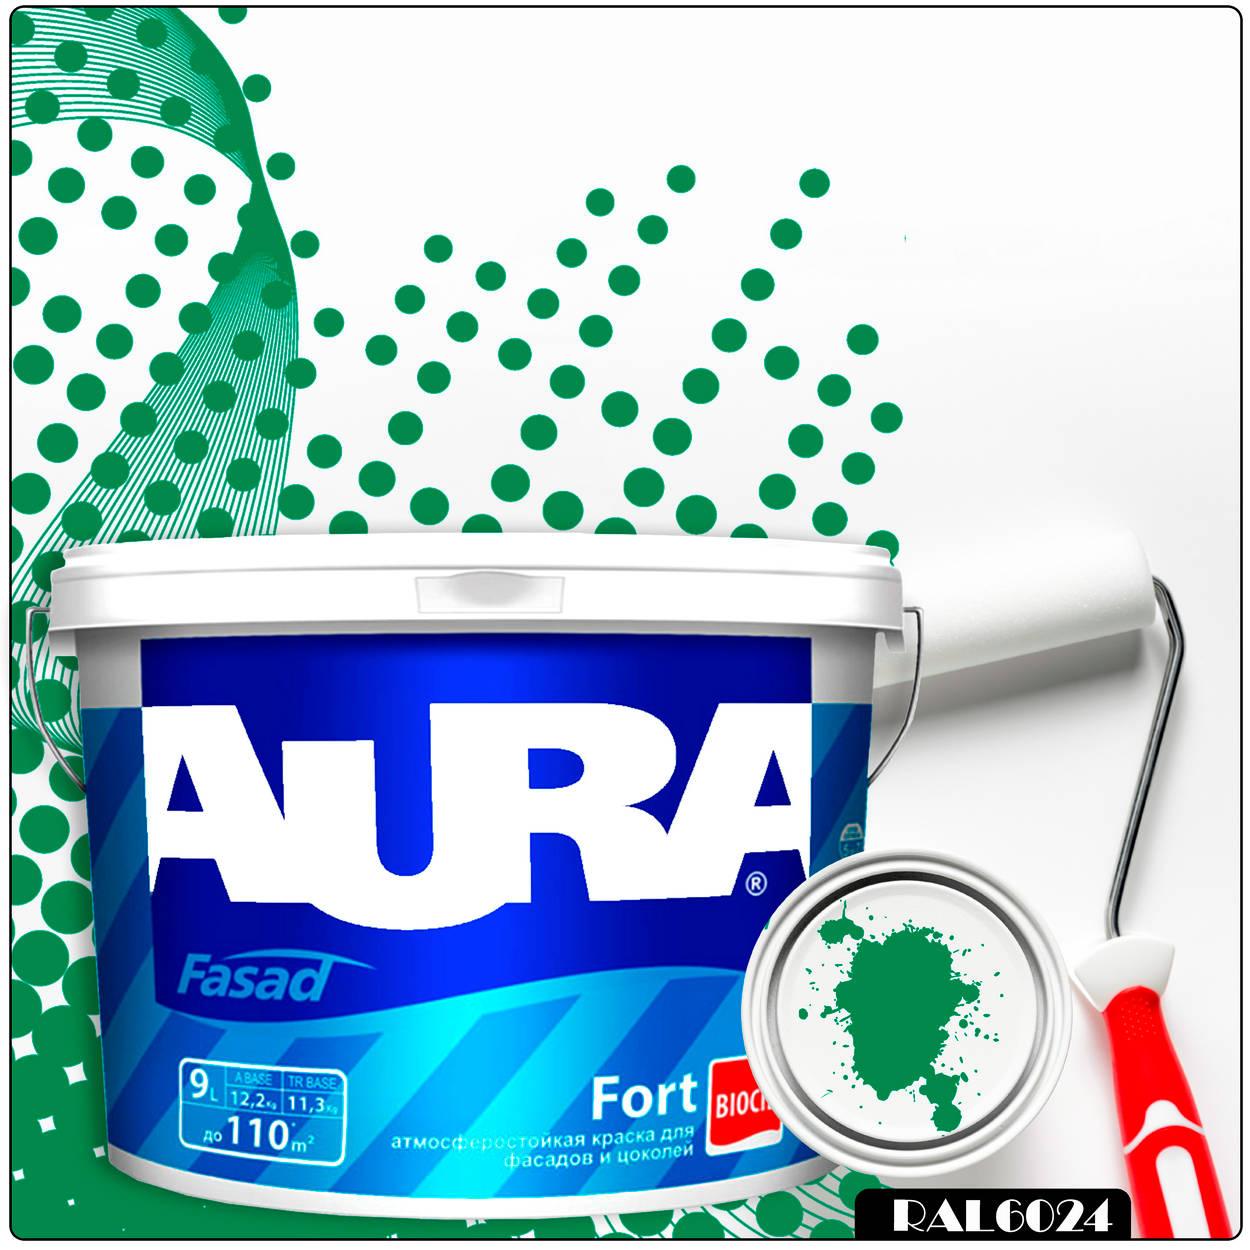 Фото 24 - Краска Aura Fasad Fort, RAL 6024 Транспортный зелёный, латексная, матовая, для фасада и цоколей, 9л, Аура.